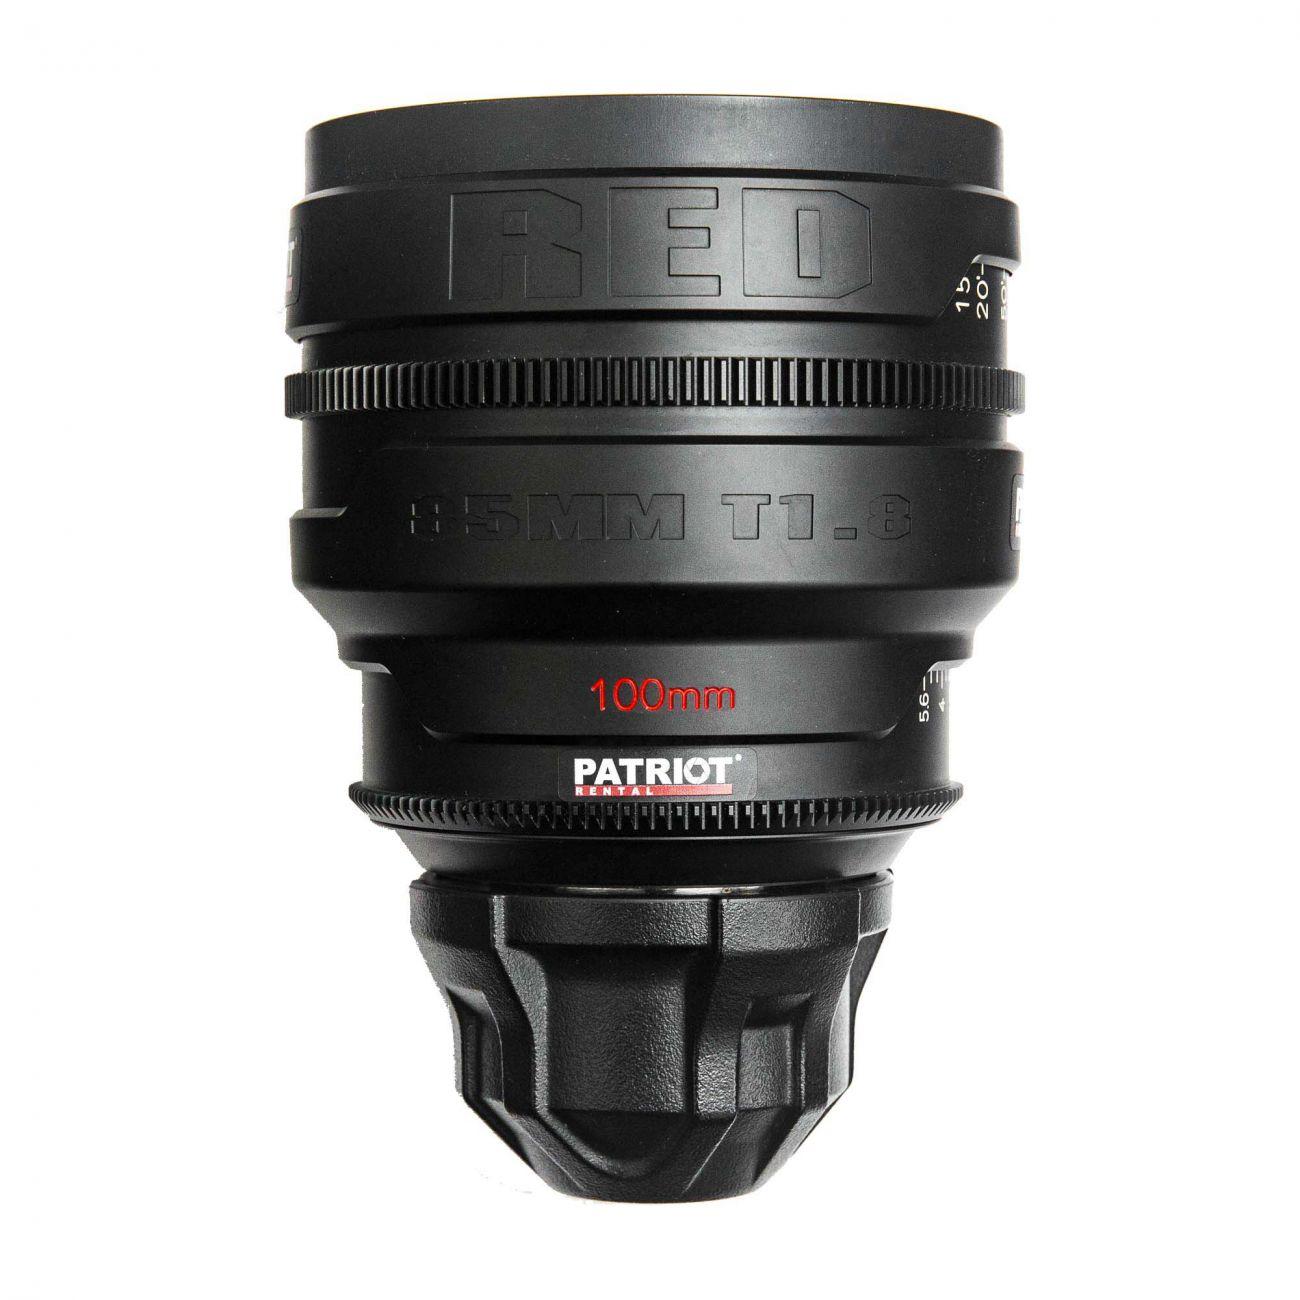 100mm RED PRO PRIME lens T1.8